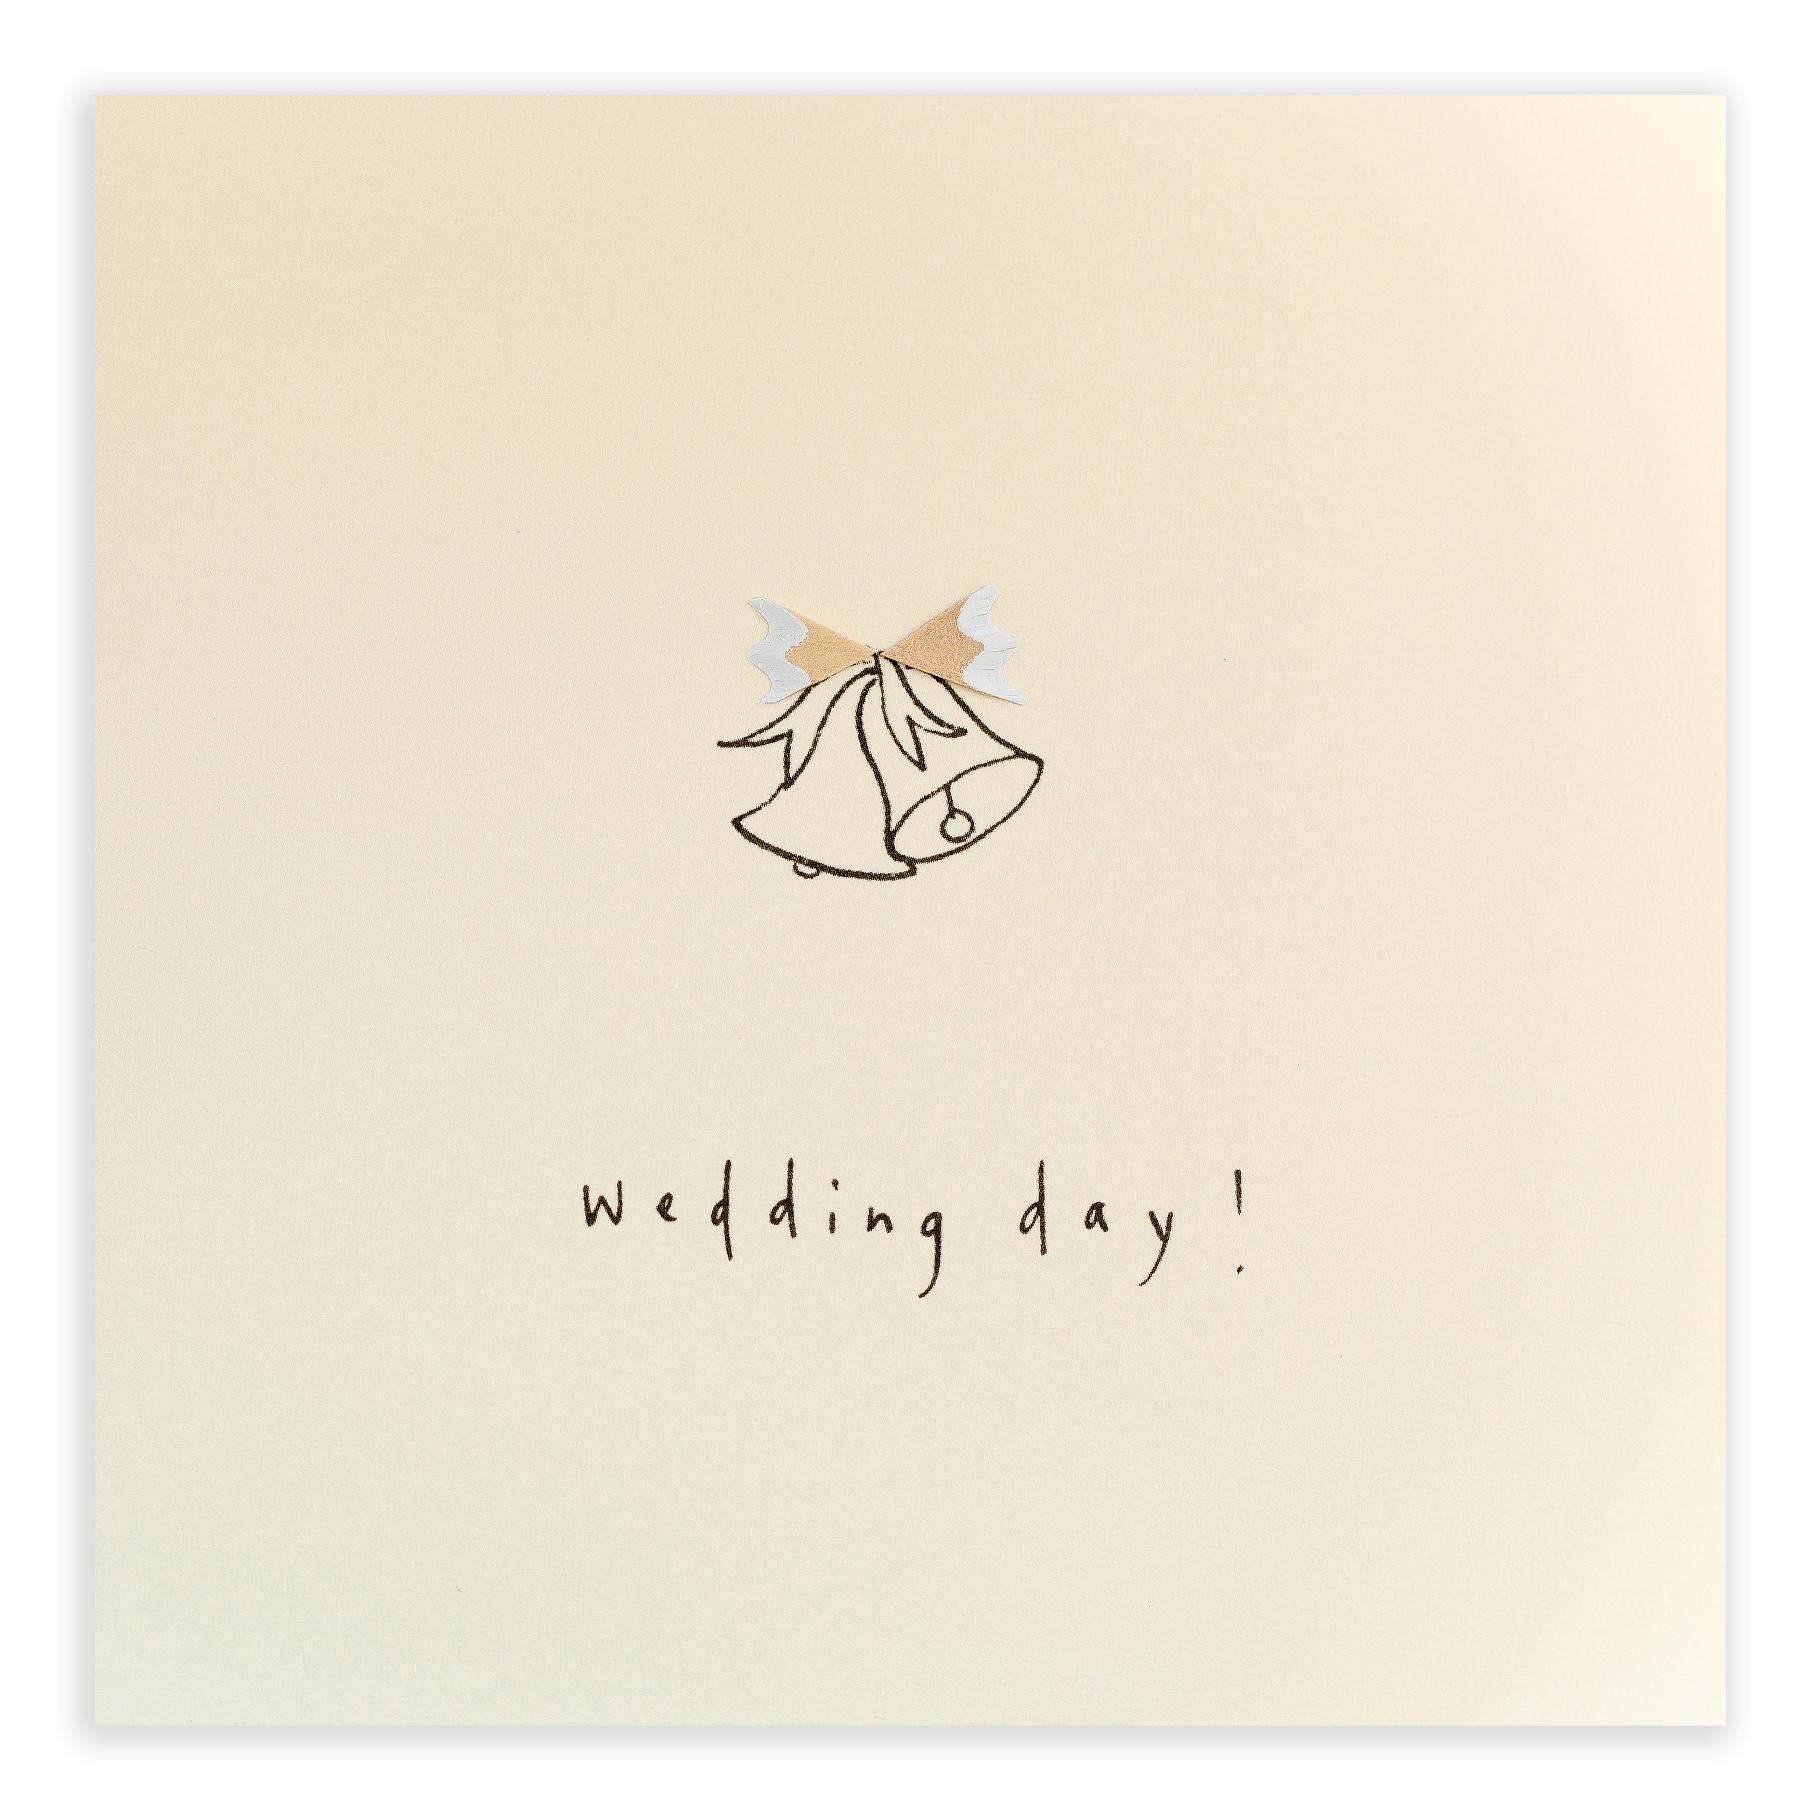 Wedding bells pencil shaving greeting card description m4hsunfo